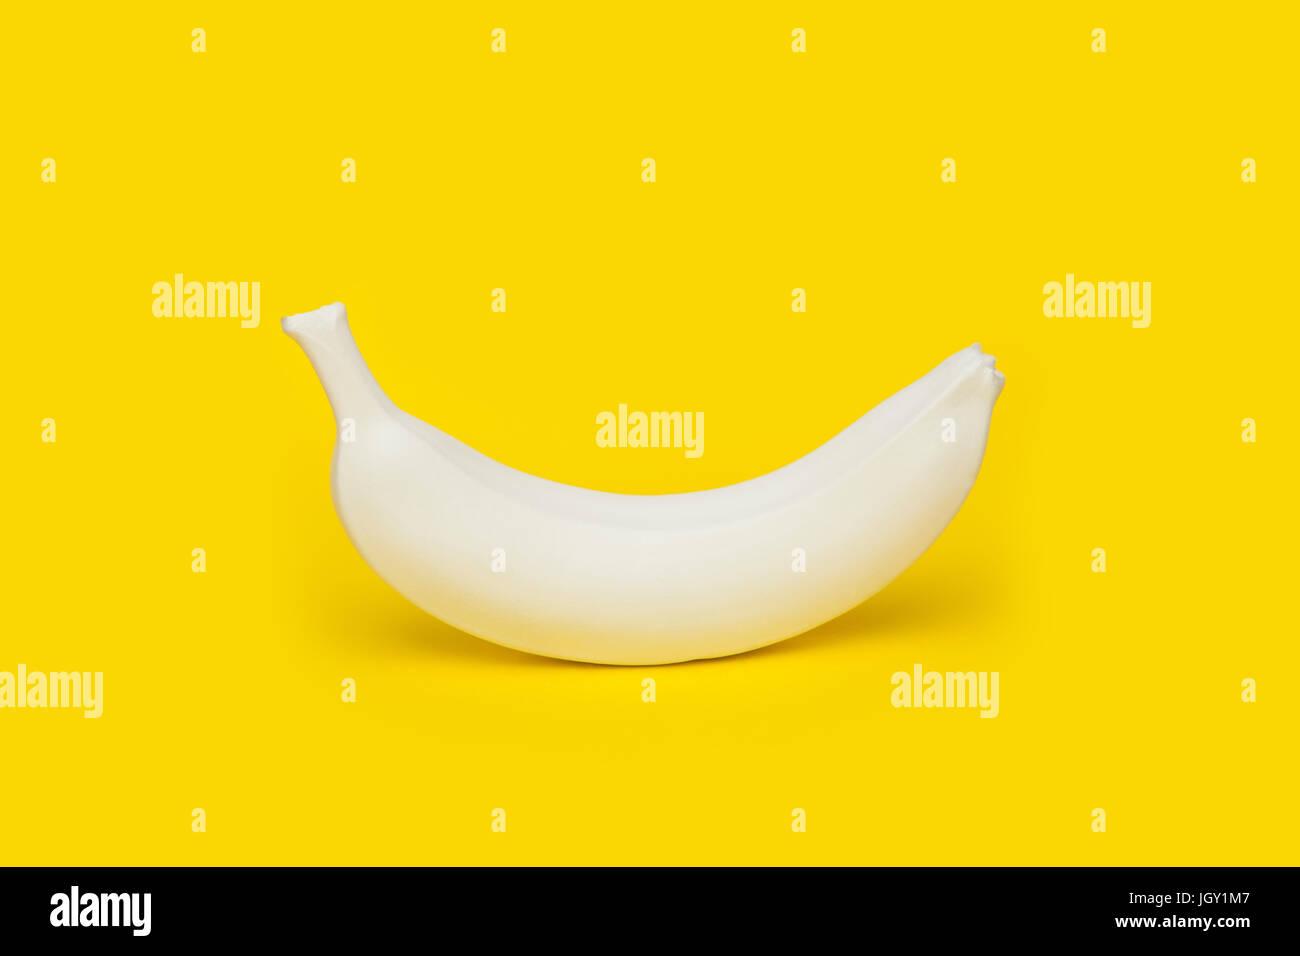 Banana painted white on yellow background - Stock Image